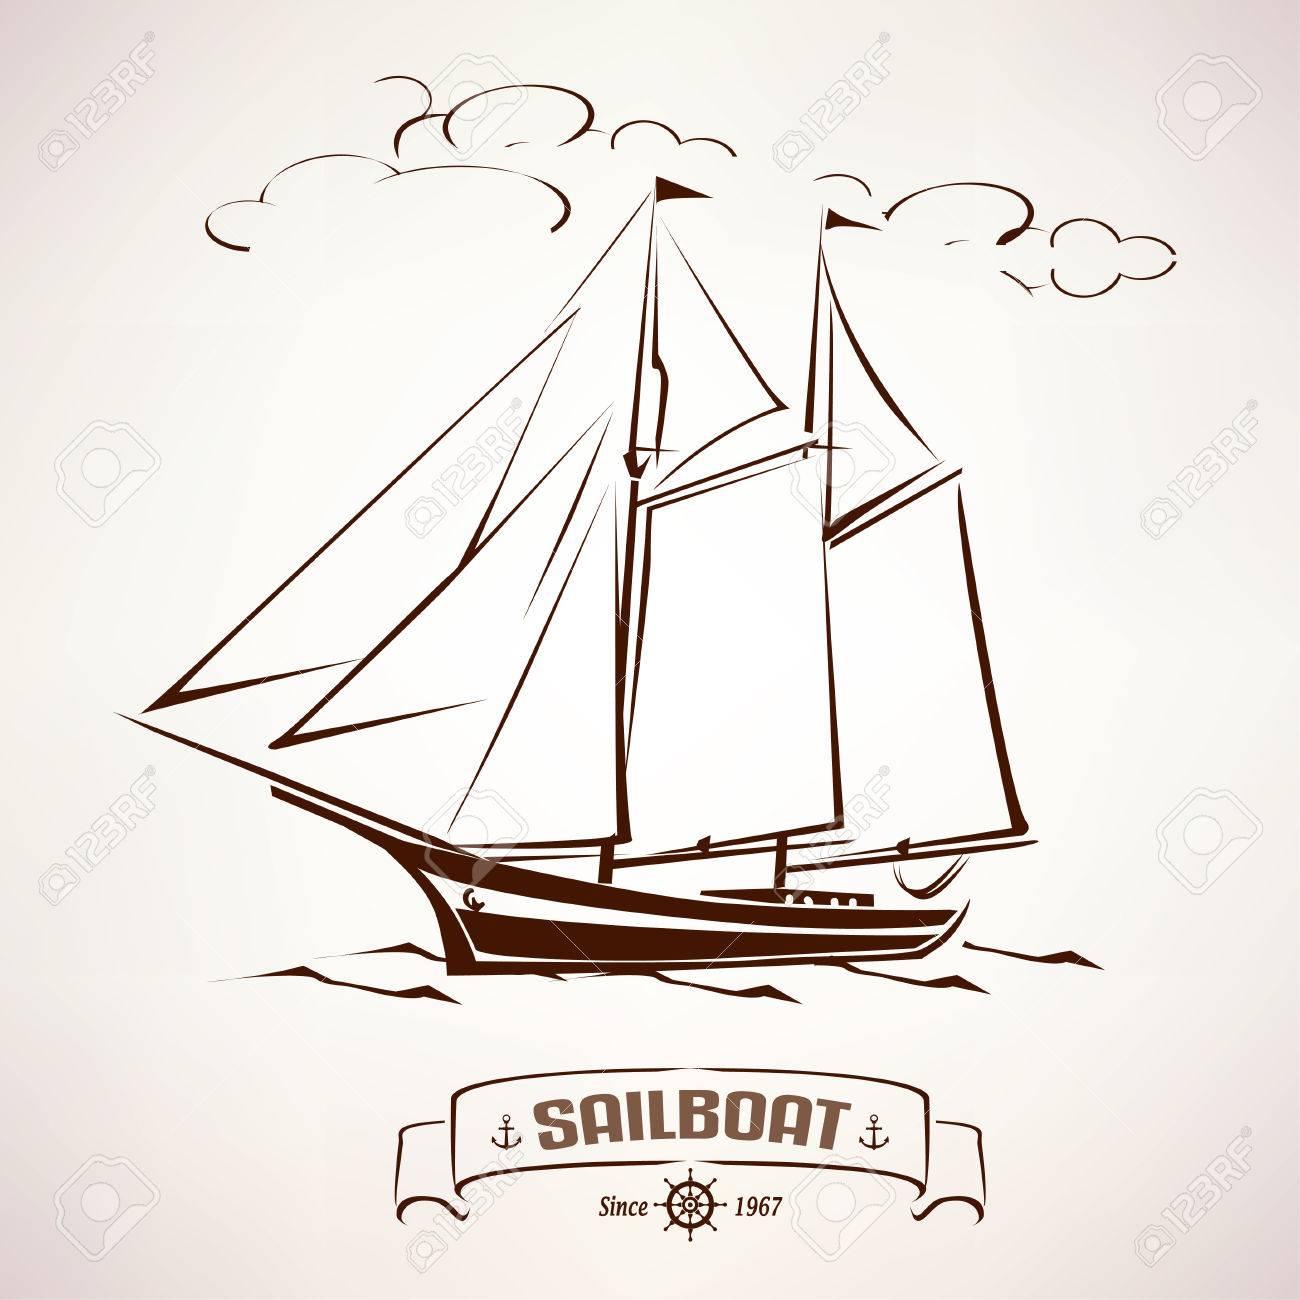 1300x1300 Sailboat, Vintage Wooden Ship Vector Sketch Royalty Free Cliparts